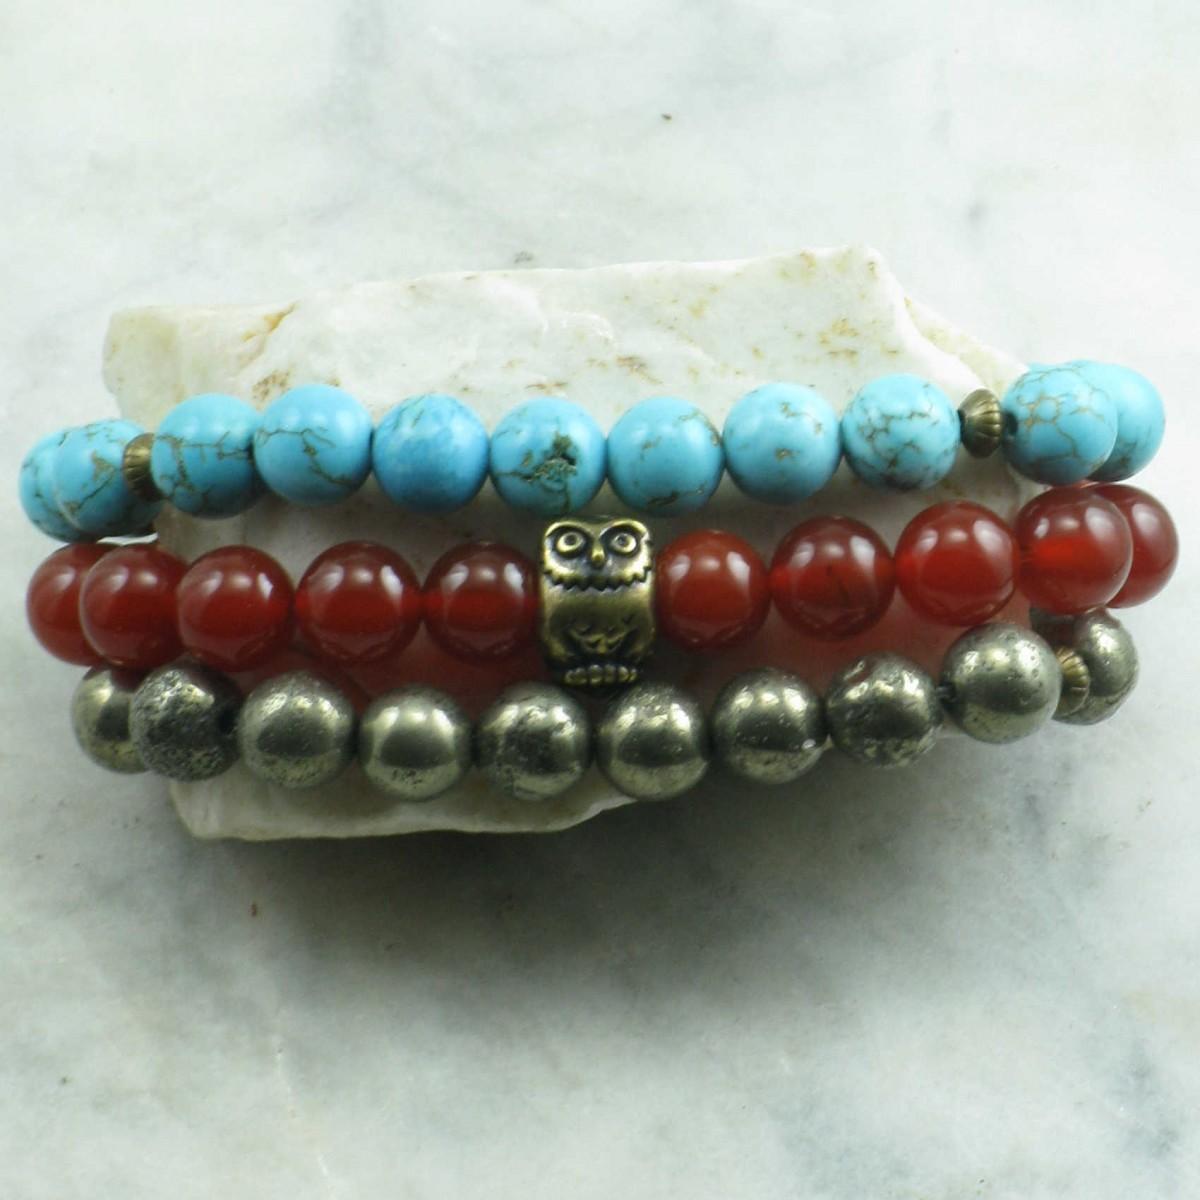 Durga_Stack_Mala_Beads_Turquoise_Carnelian_Pyrite_Mala_Bracelets